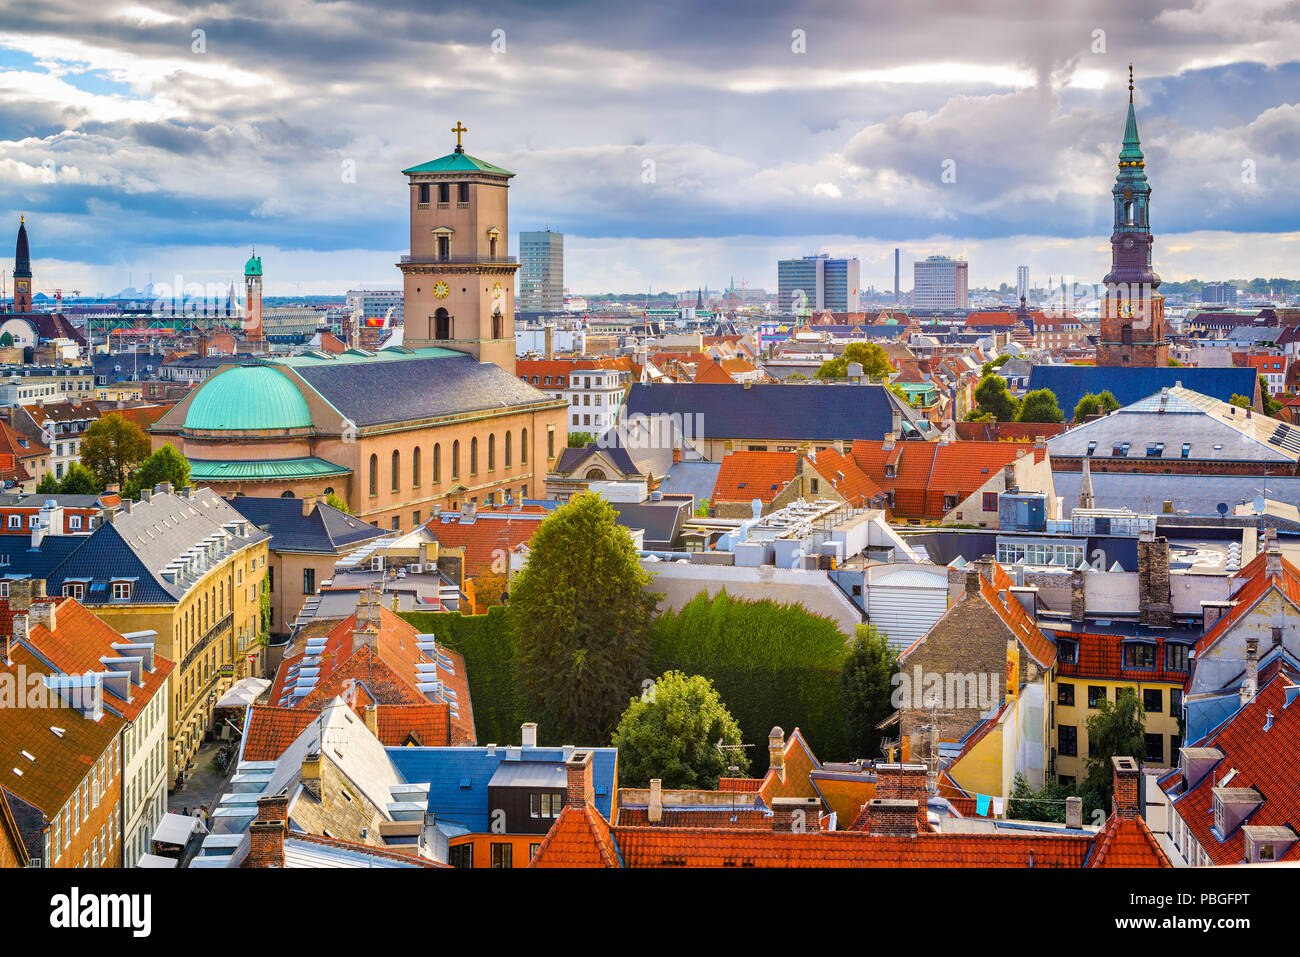 Copenhague, Danemark, vieille ville. Photo Stock